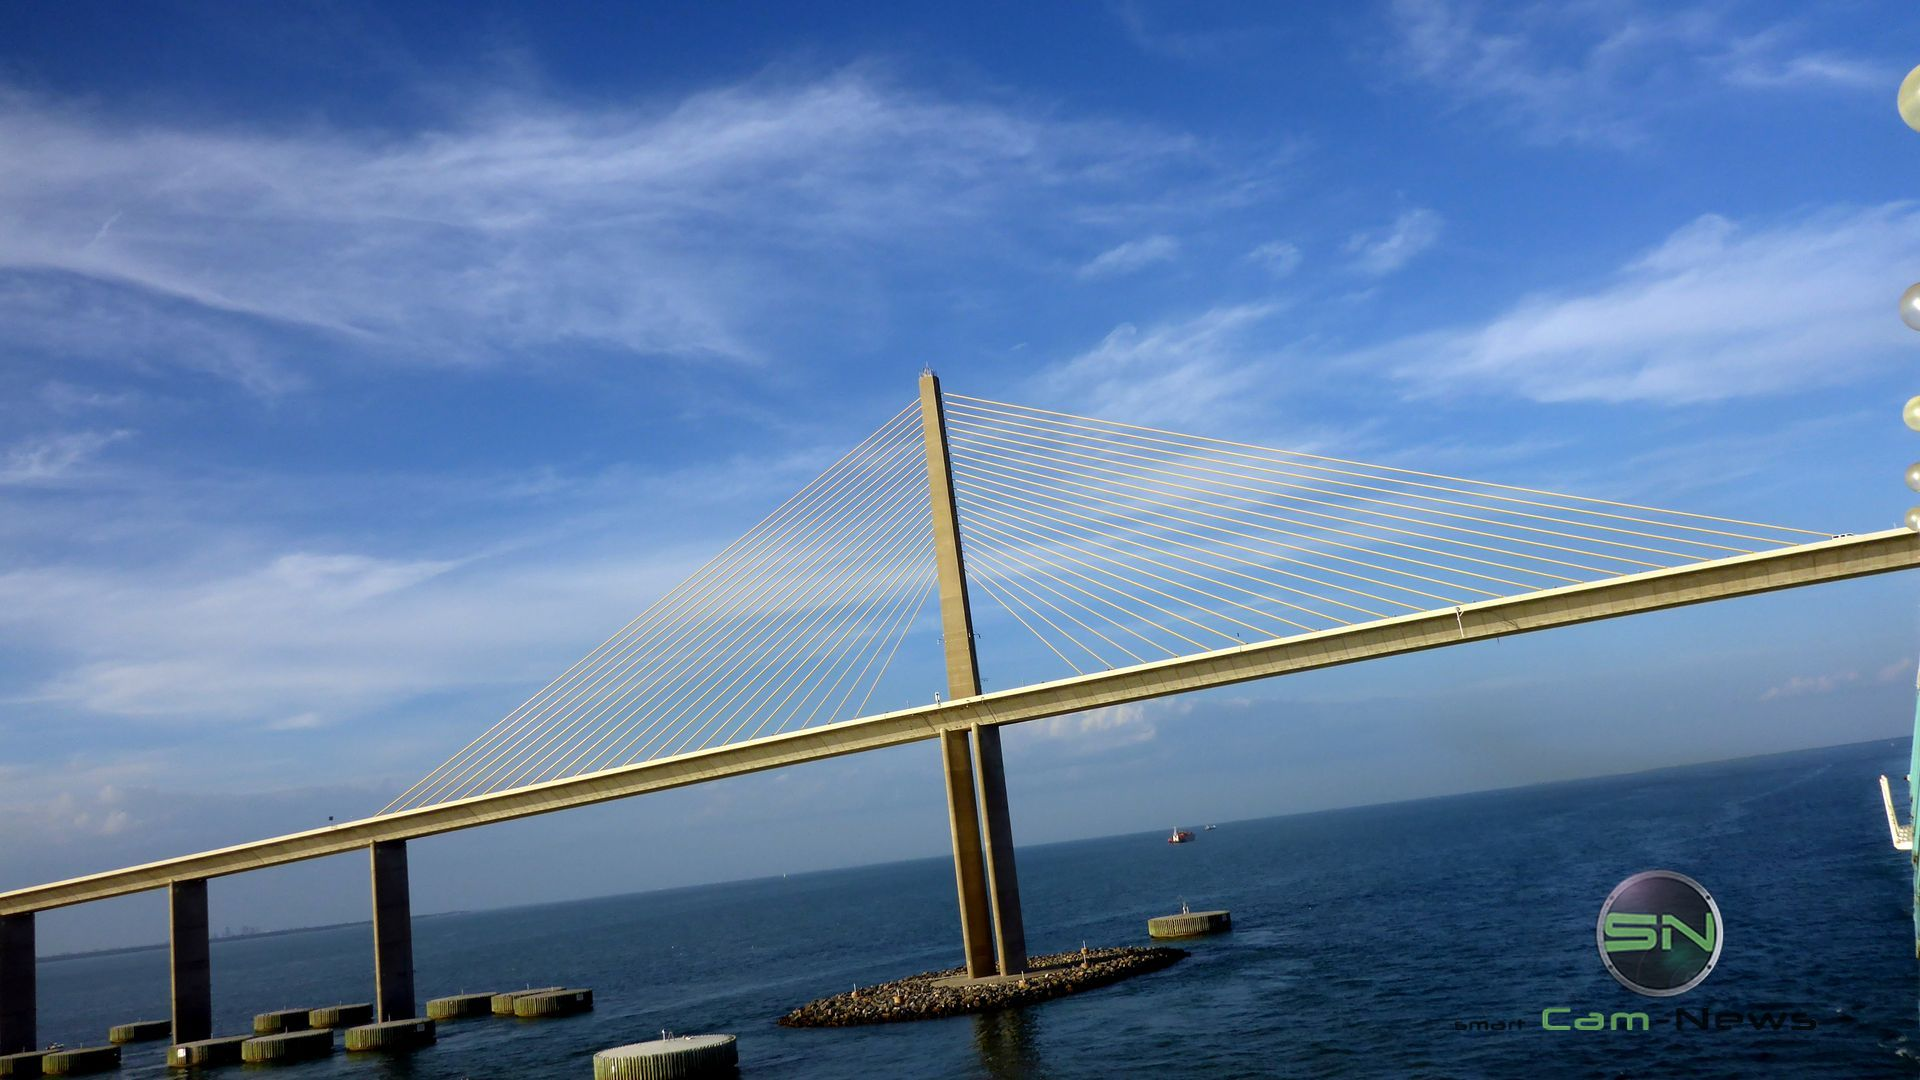 die Brücke - Panasonic FT5 - SmartCamNews